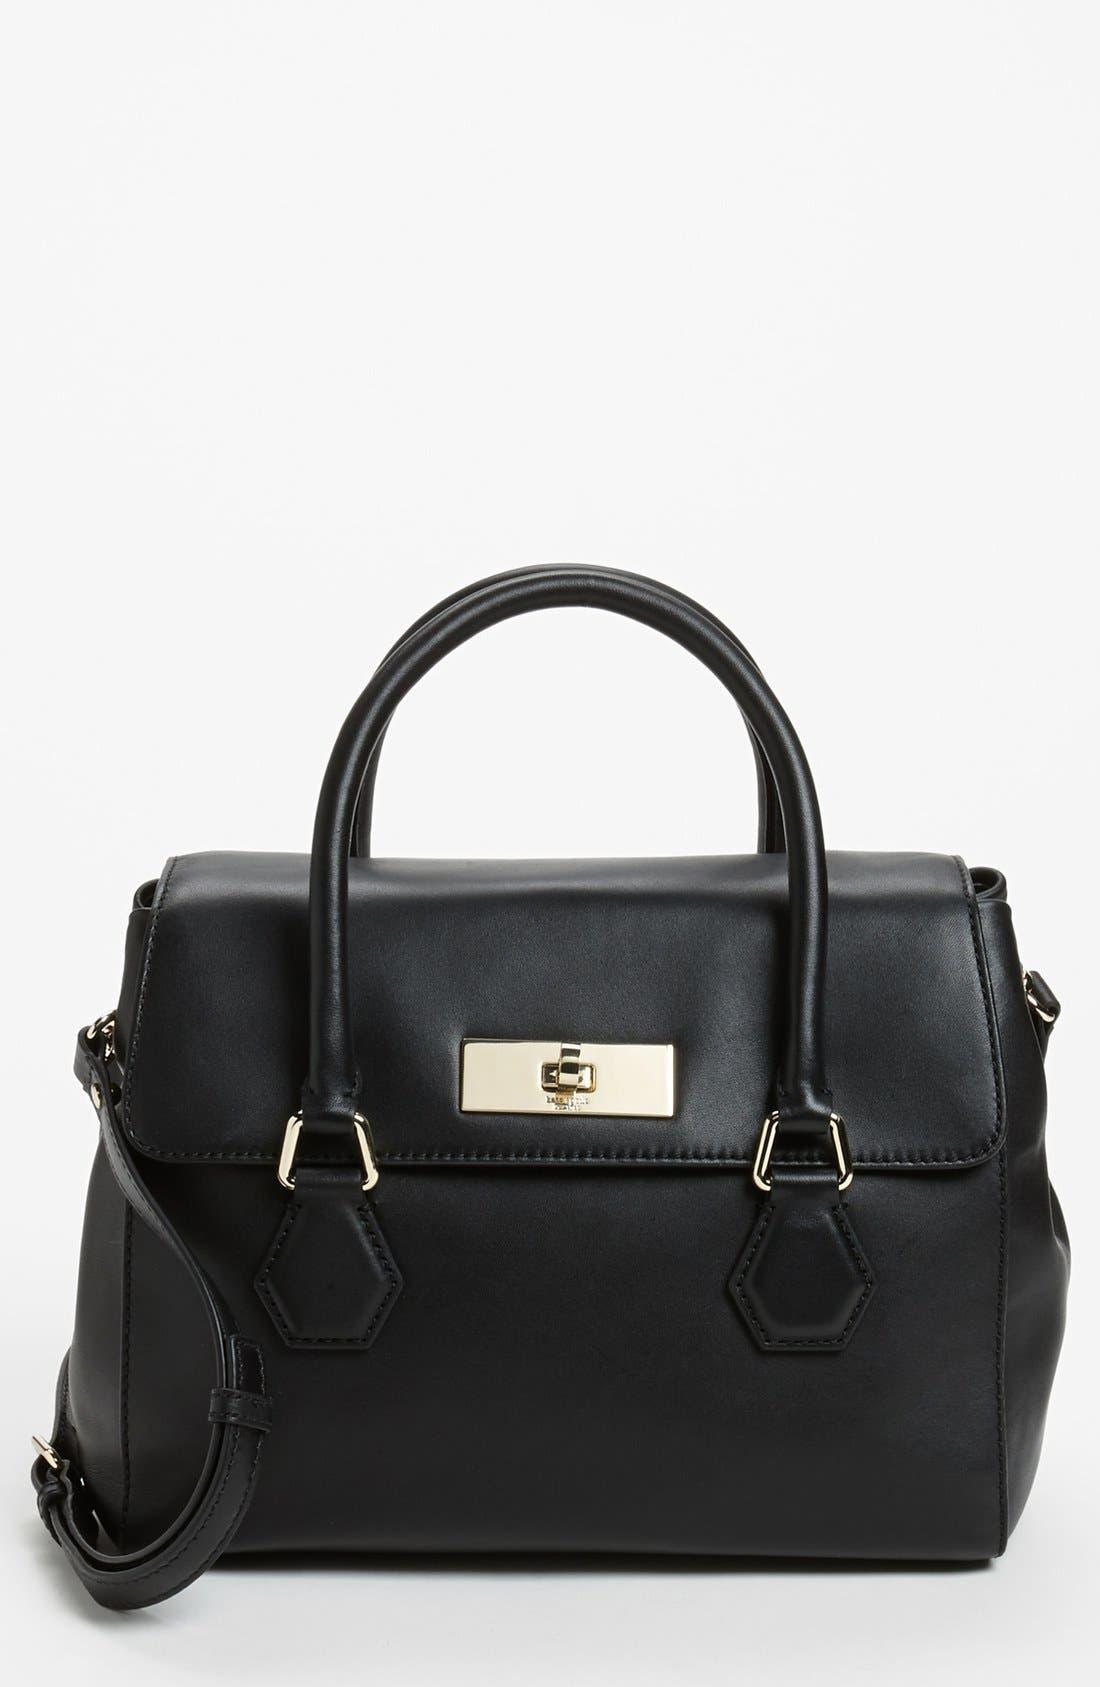 Main Image - kate spade new york 'catherine street - joanie' satchel, medium